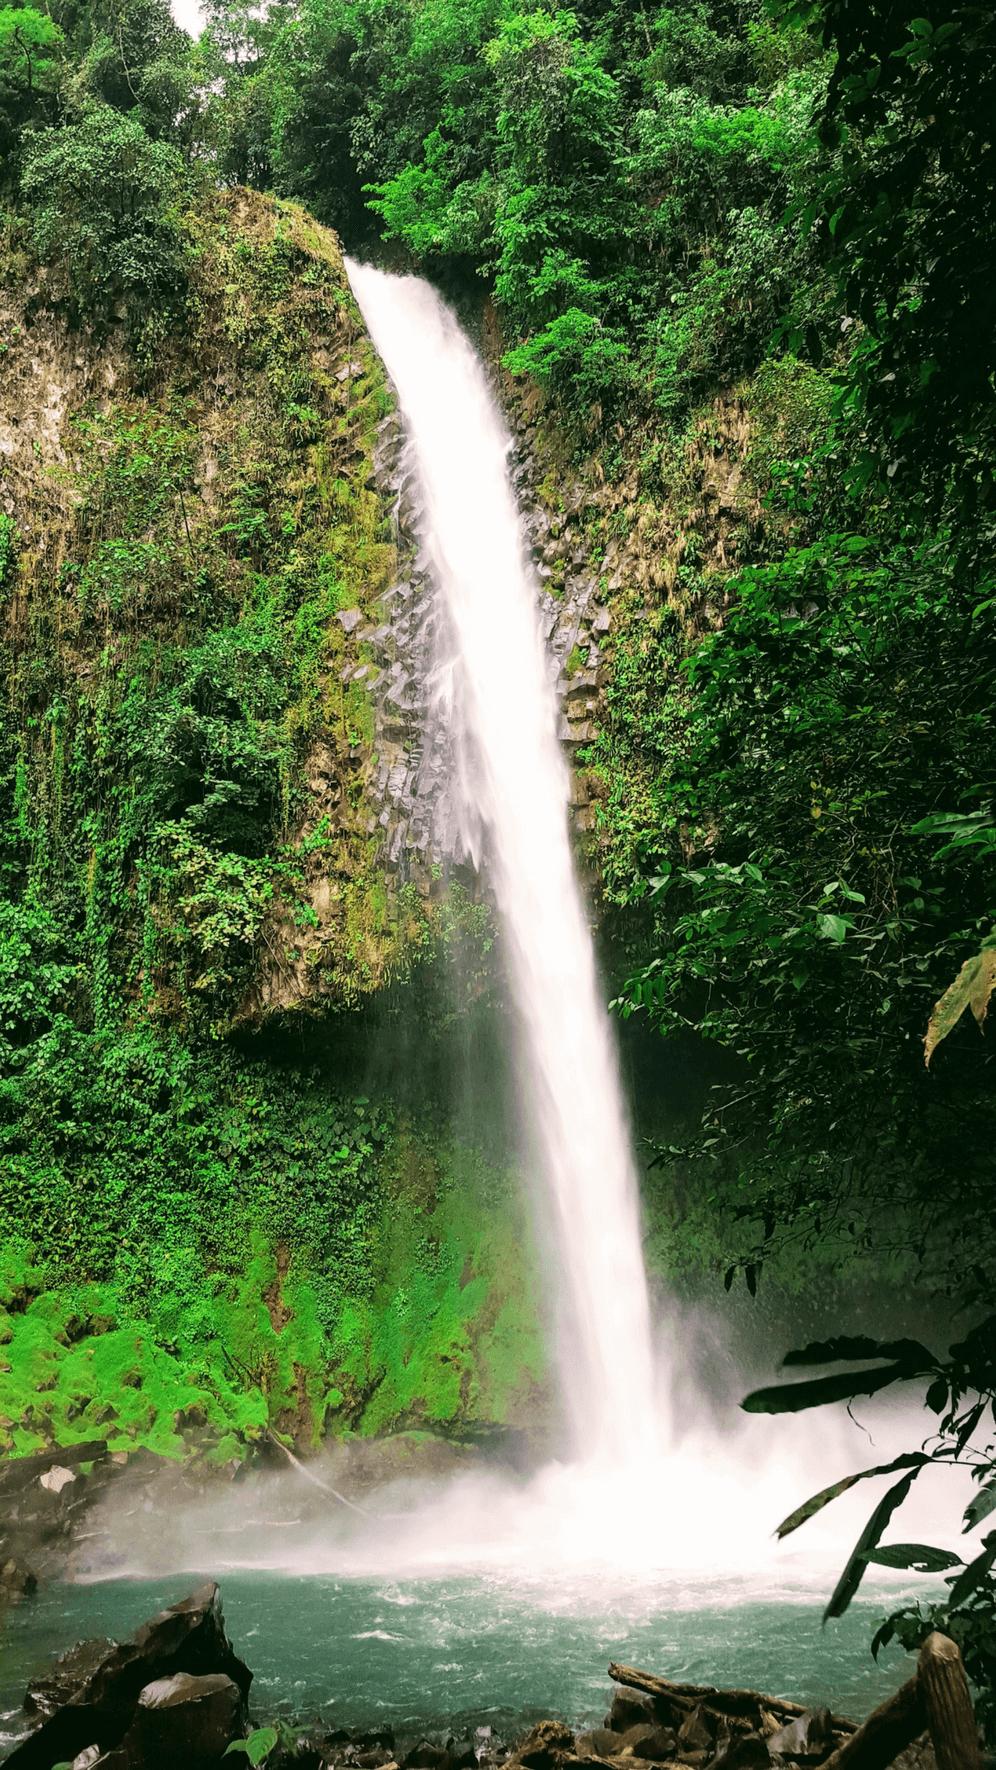 La Fortuna Waterfall, one of the best waterfalls in La Fortuna, Costa Rica